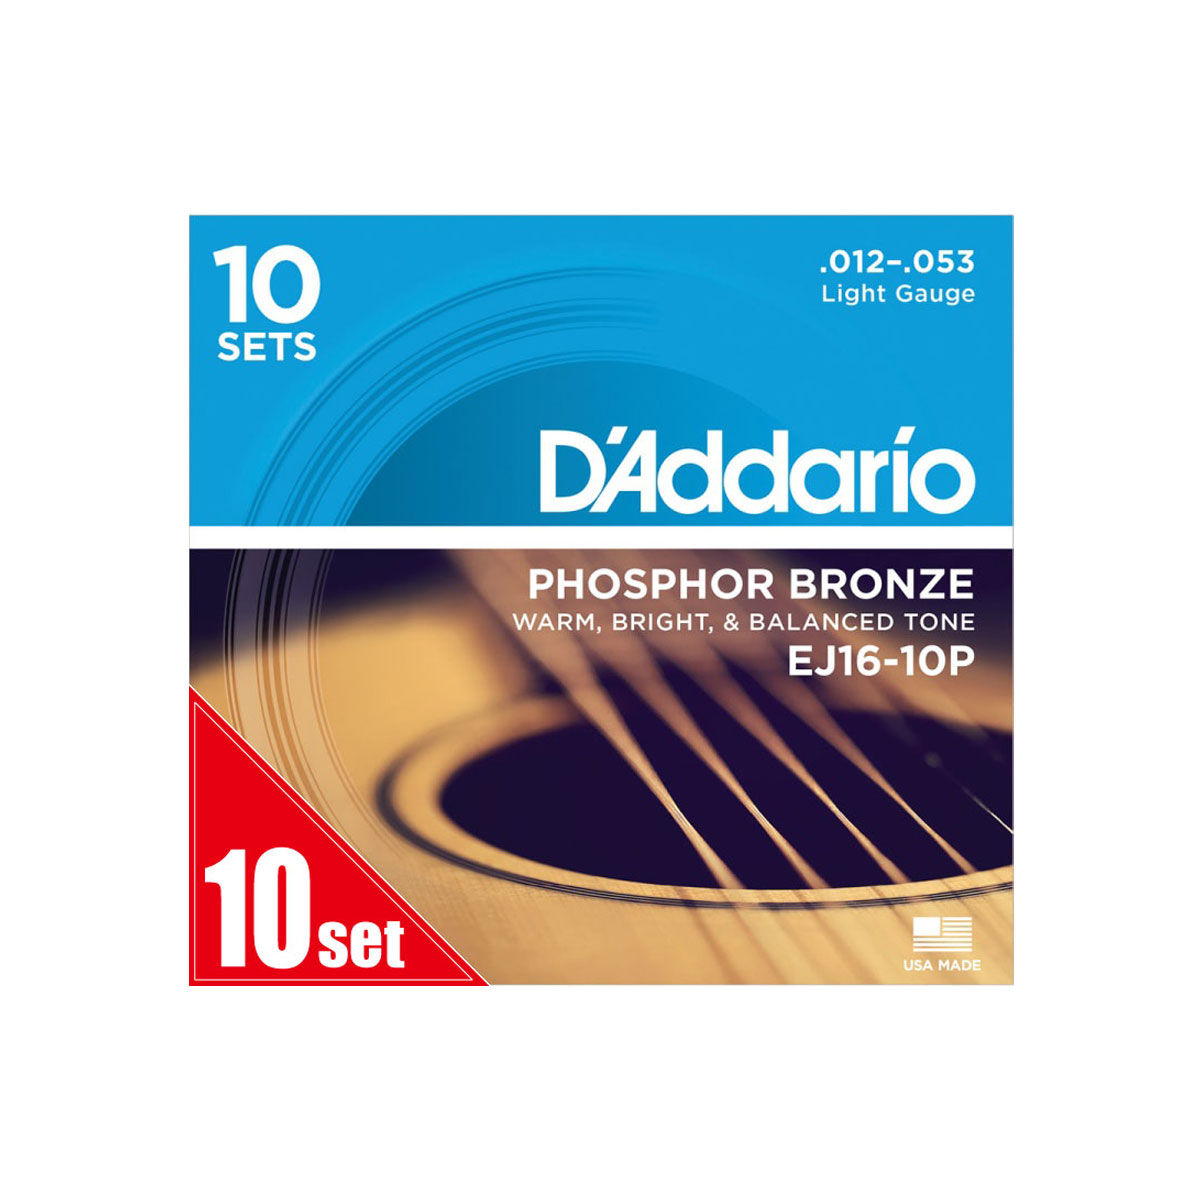 D'Addario / EJ16-10P Phosphor Bronze Light 12-53 アコースティックギター弦 10セットパック 【お取り寄せ商品】